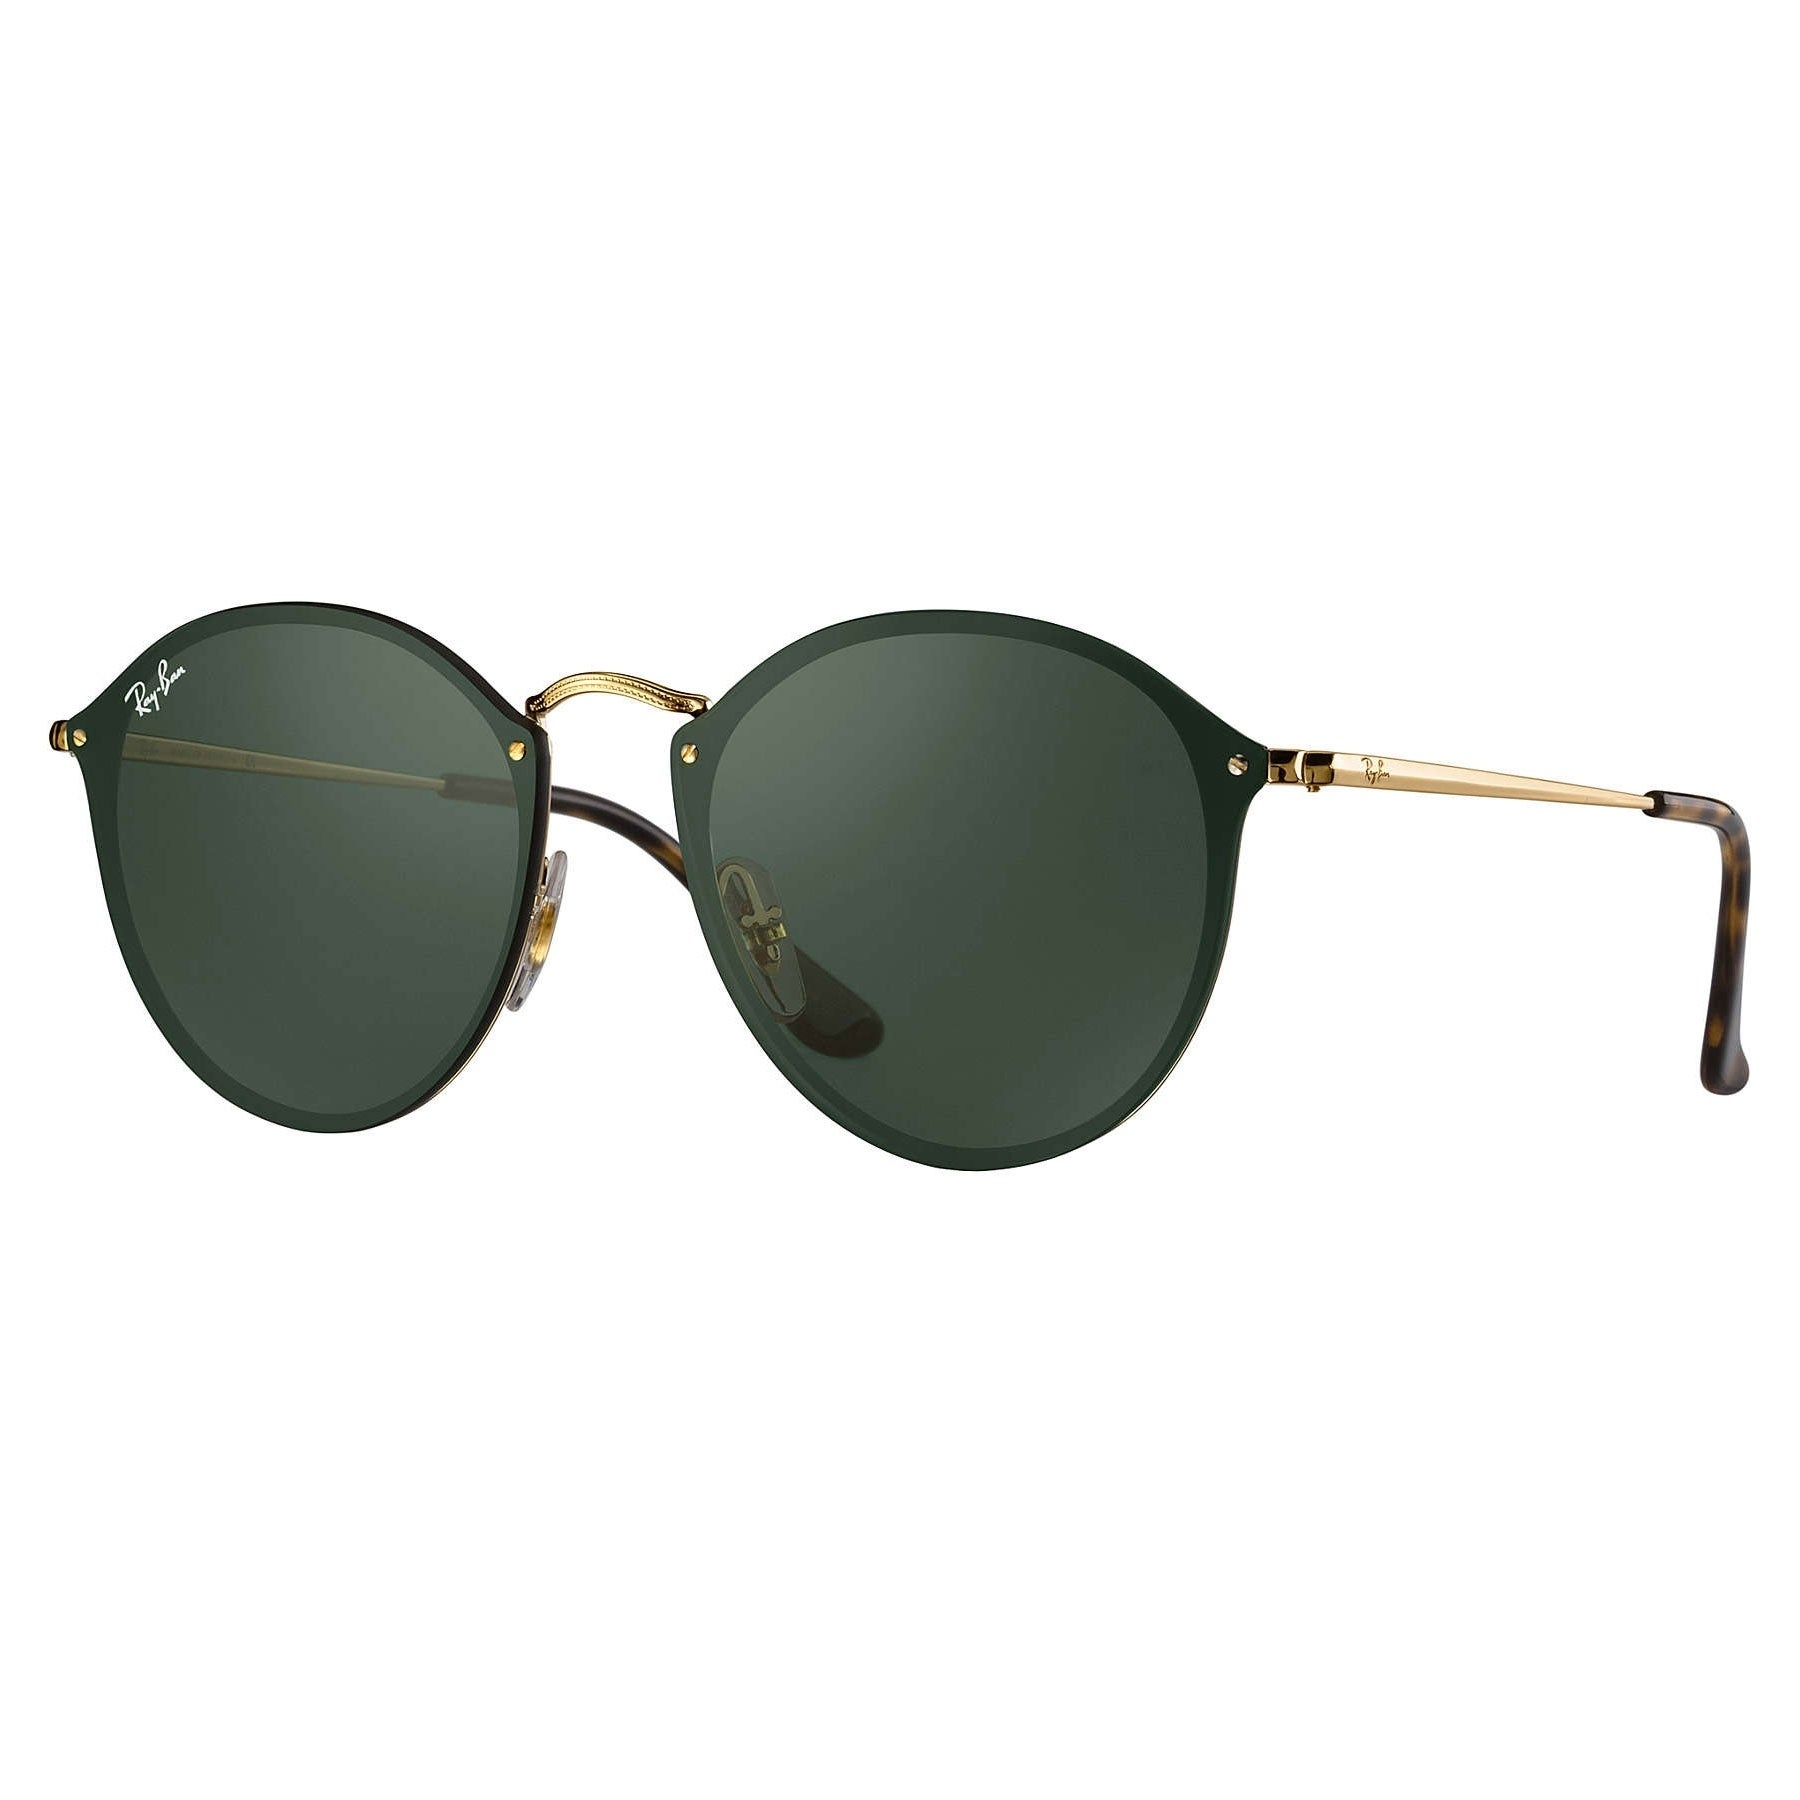 d99e28fb00 Shop Ray-Ban RB3574N Blaze Round Sunglasses Gold  Green Classic 59mm ...